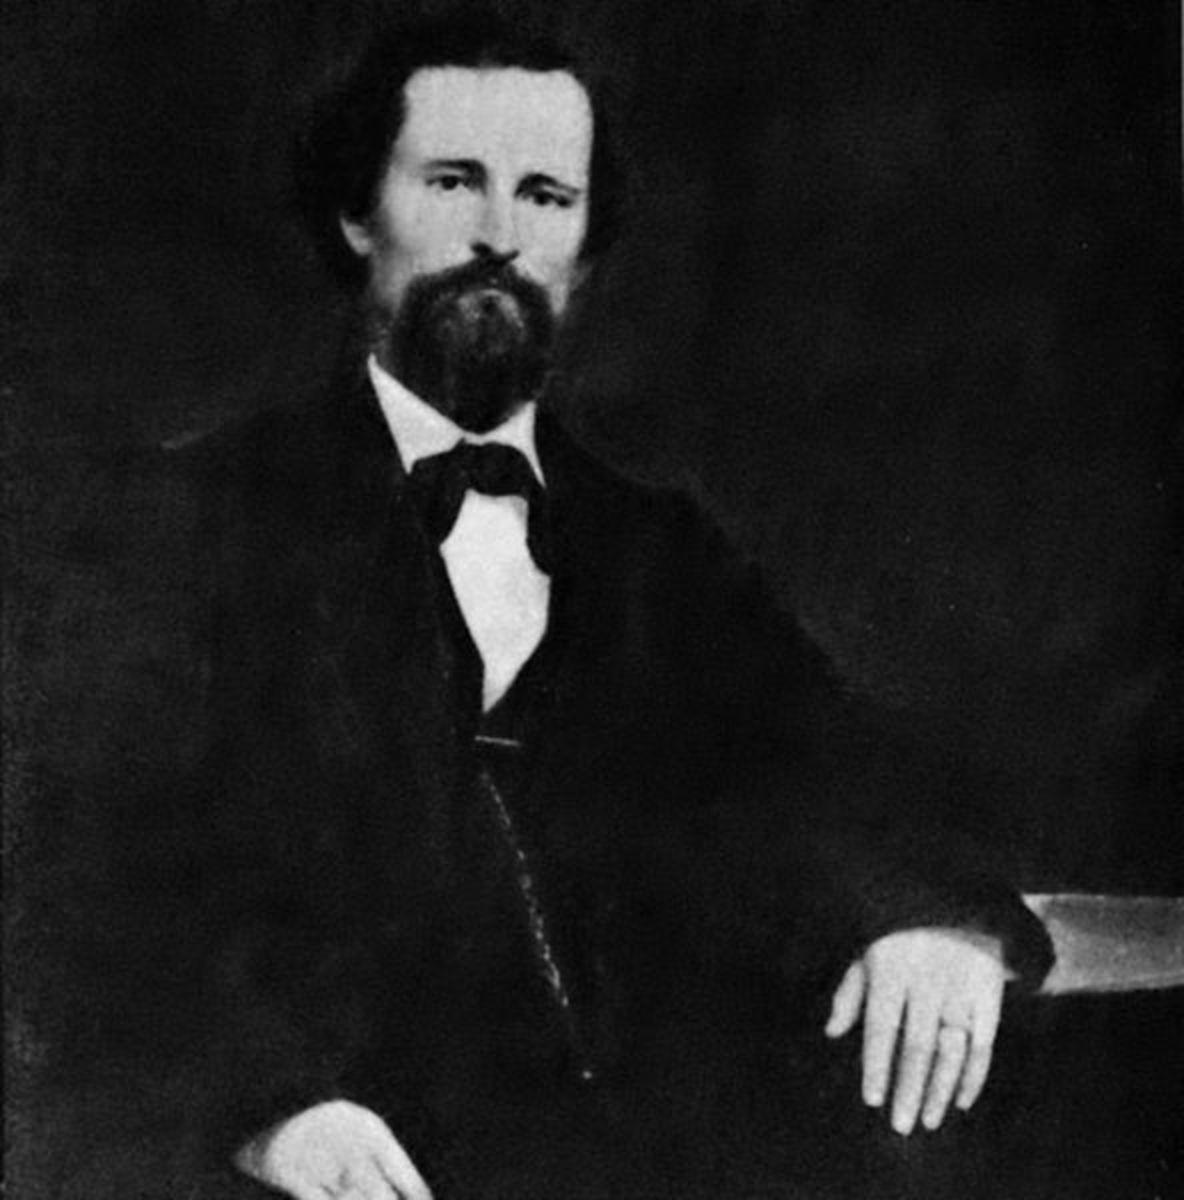 Sandy Bowers, 1833 - 1868